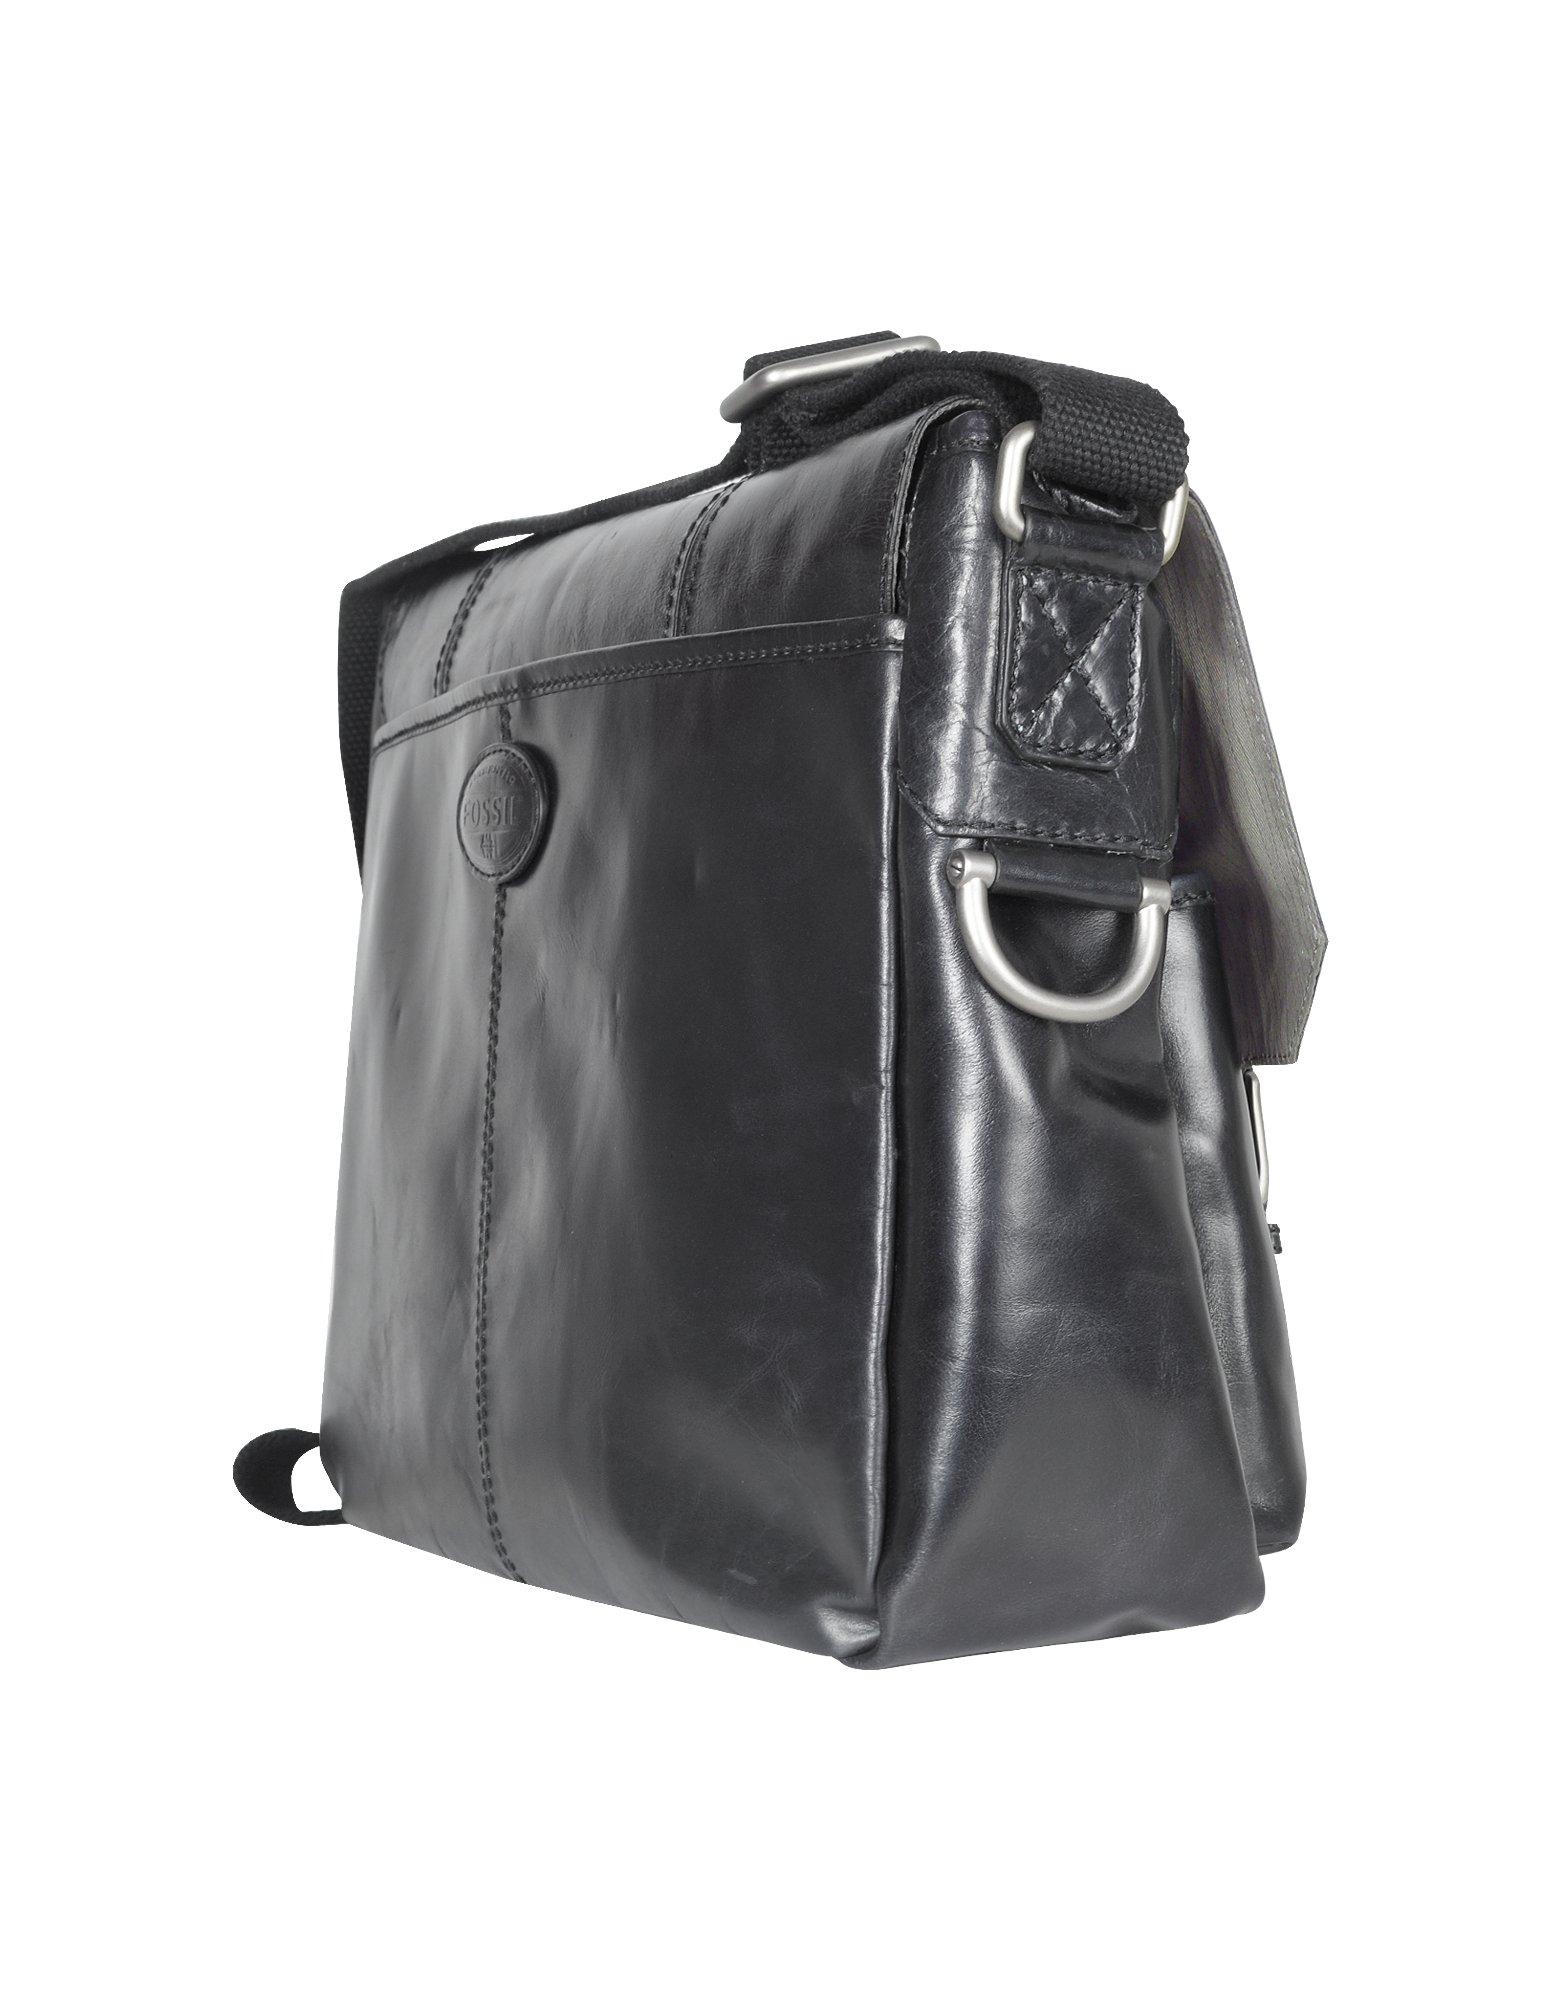 Fossil Dayton - Leather Messenger Bag in Black (Brown) for ...